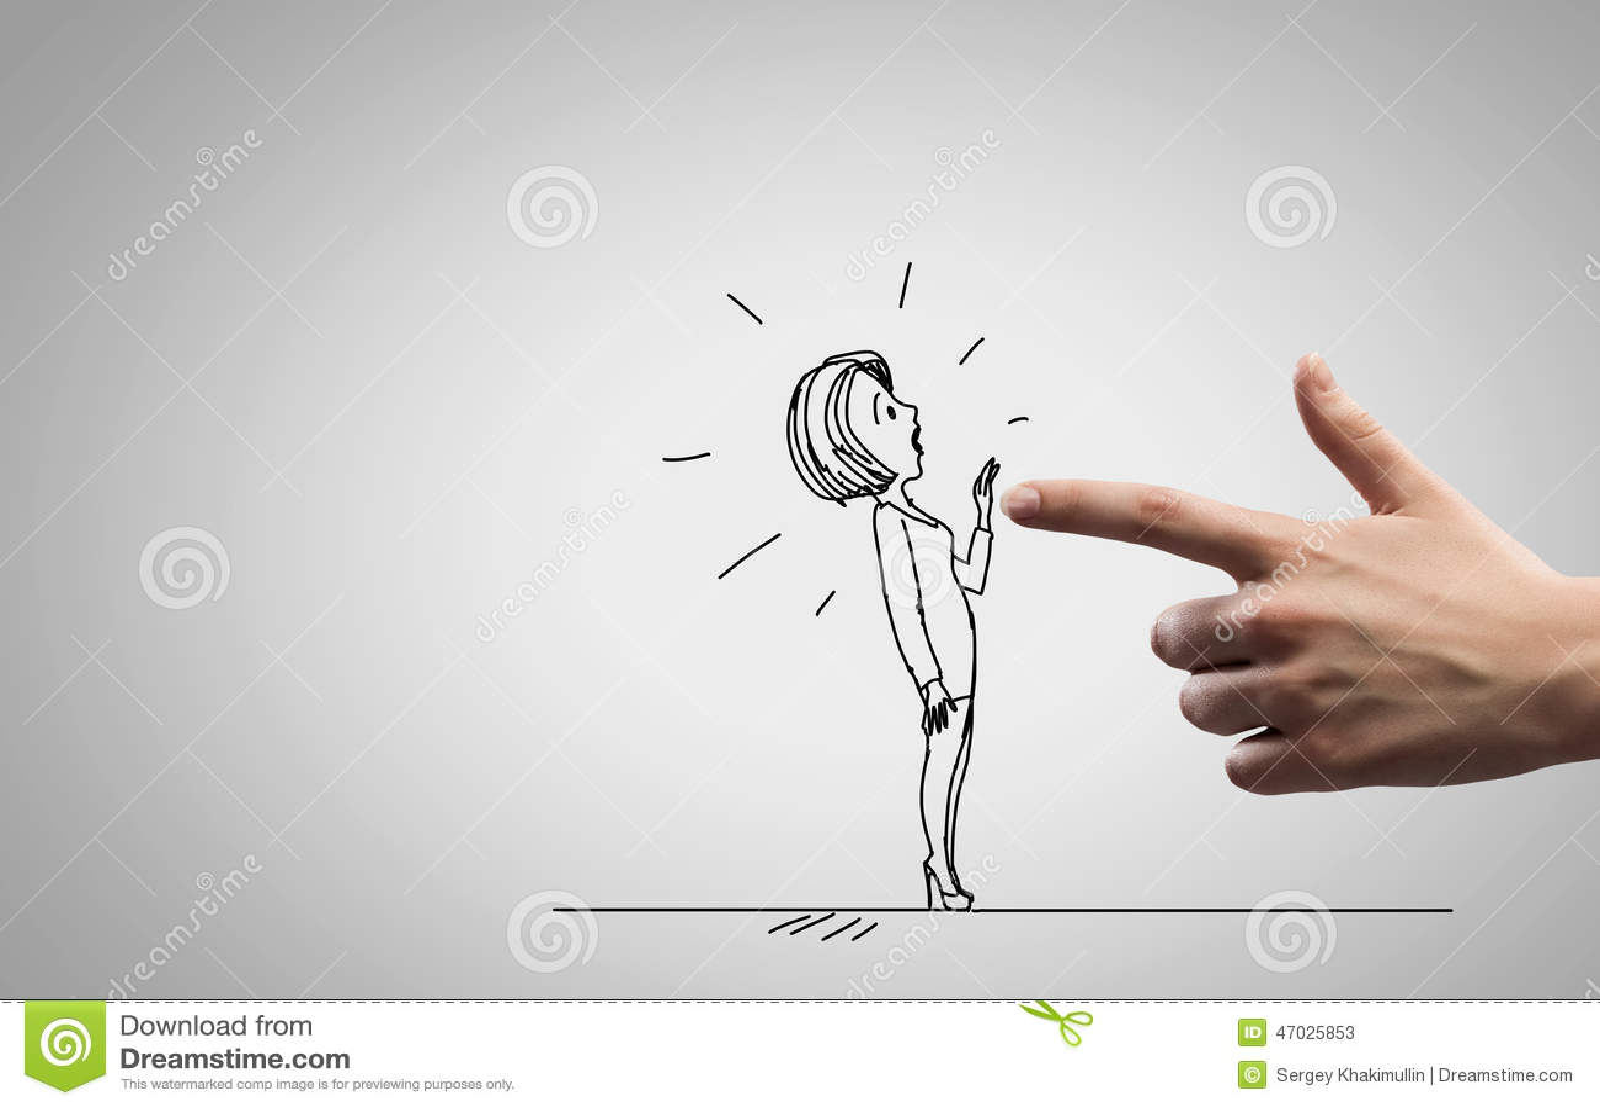 Caricature Drôle Illustration Stock - Image: 47025853